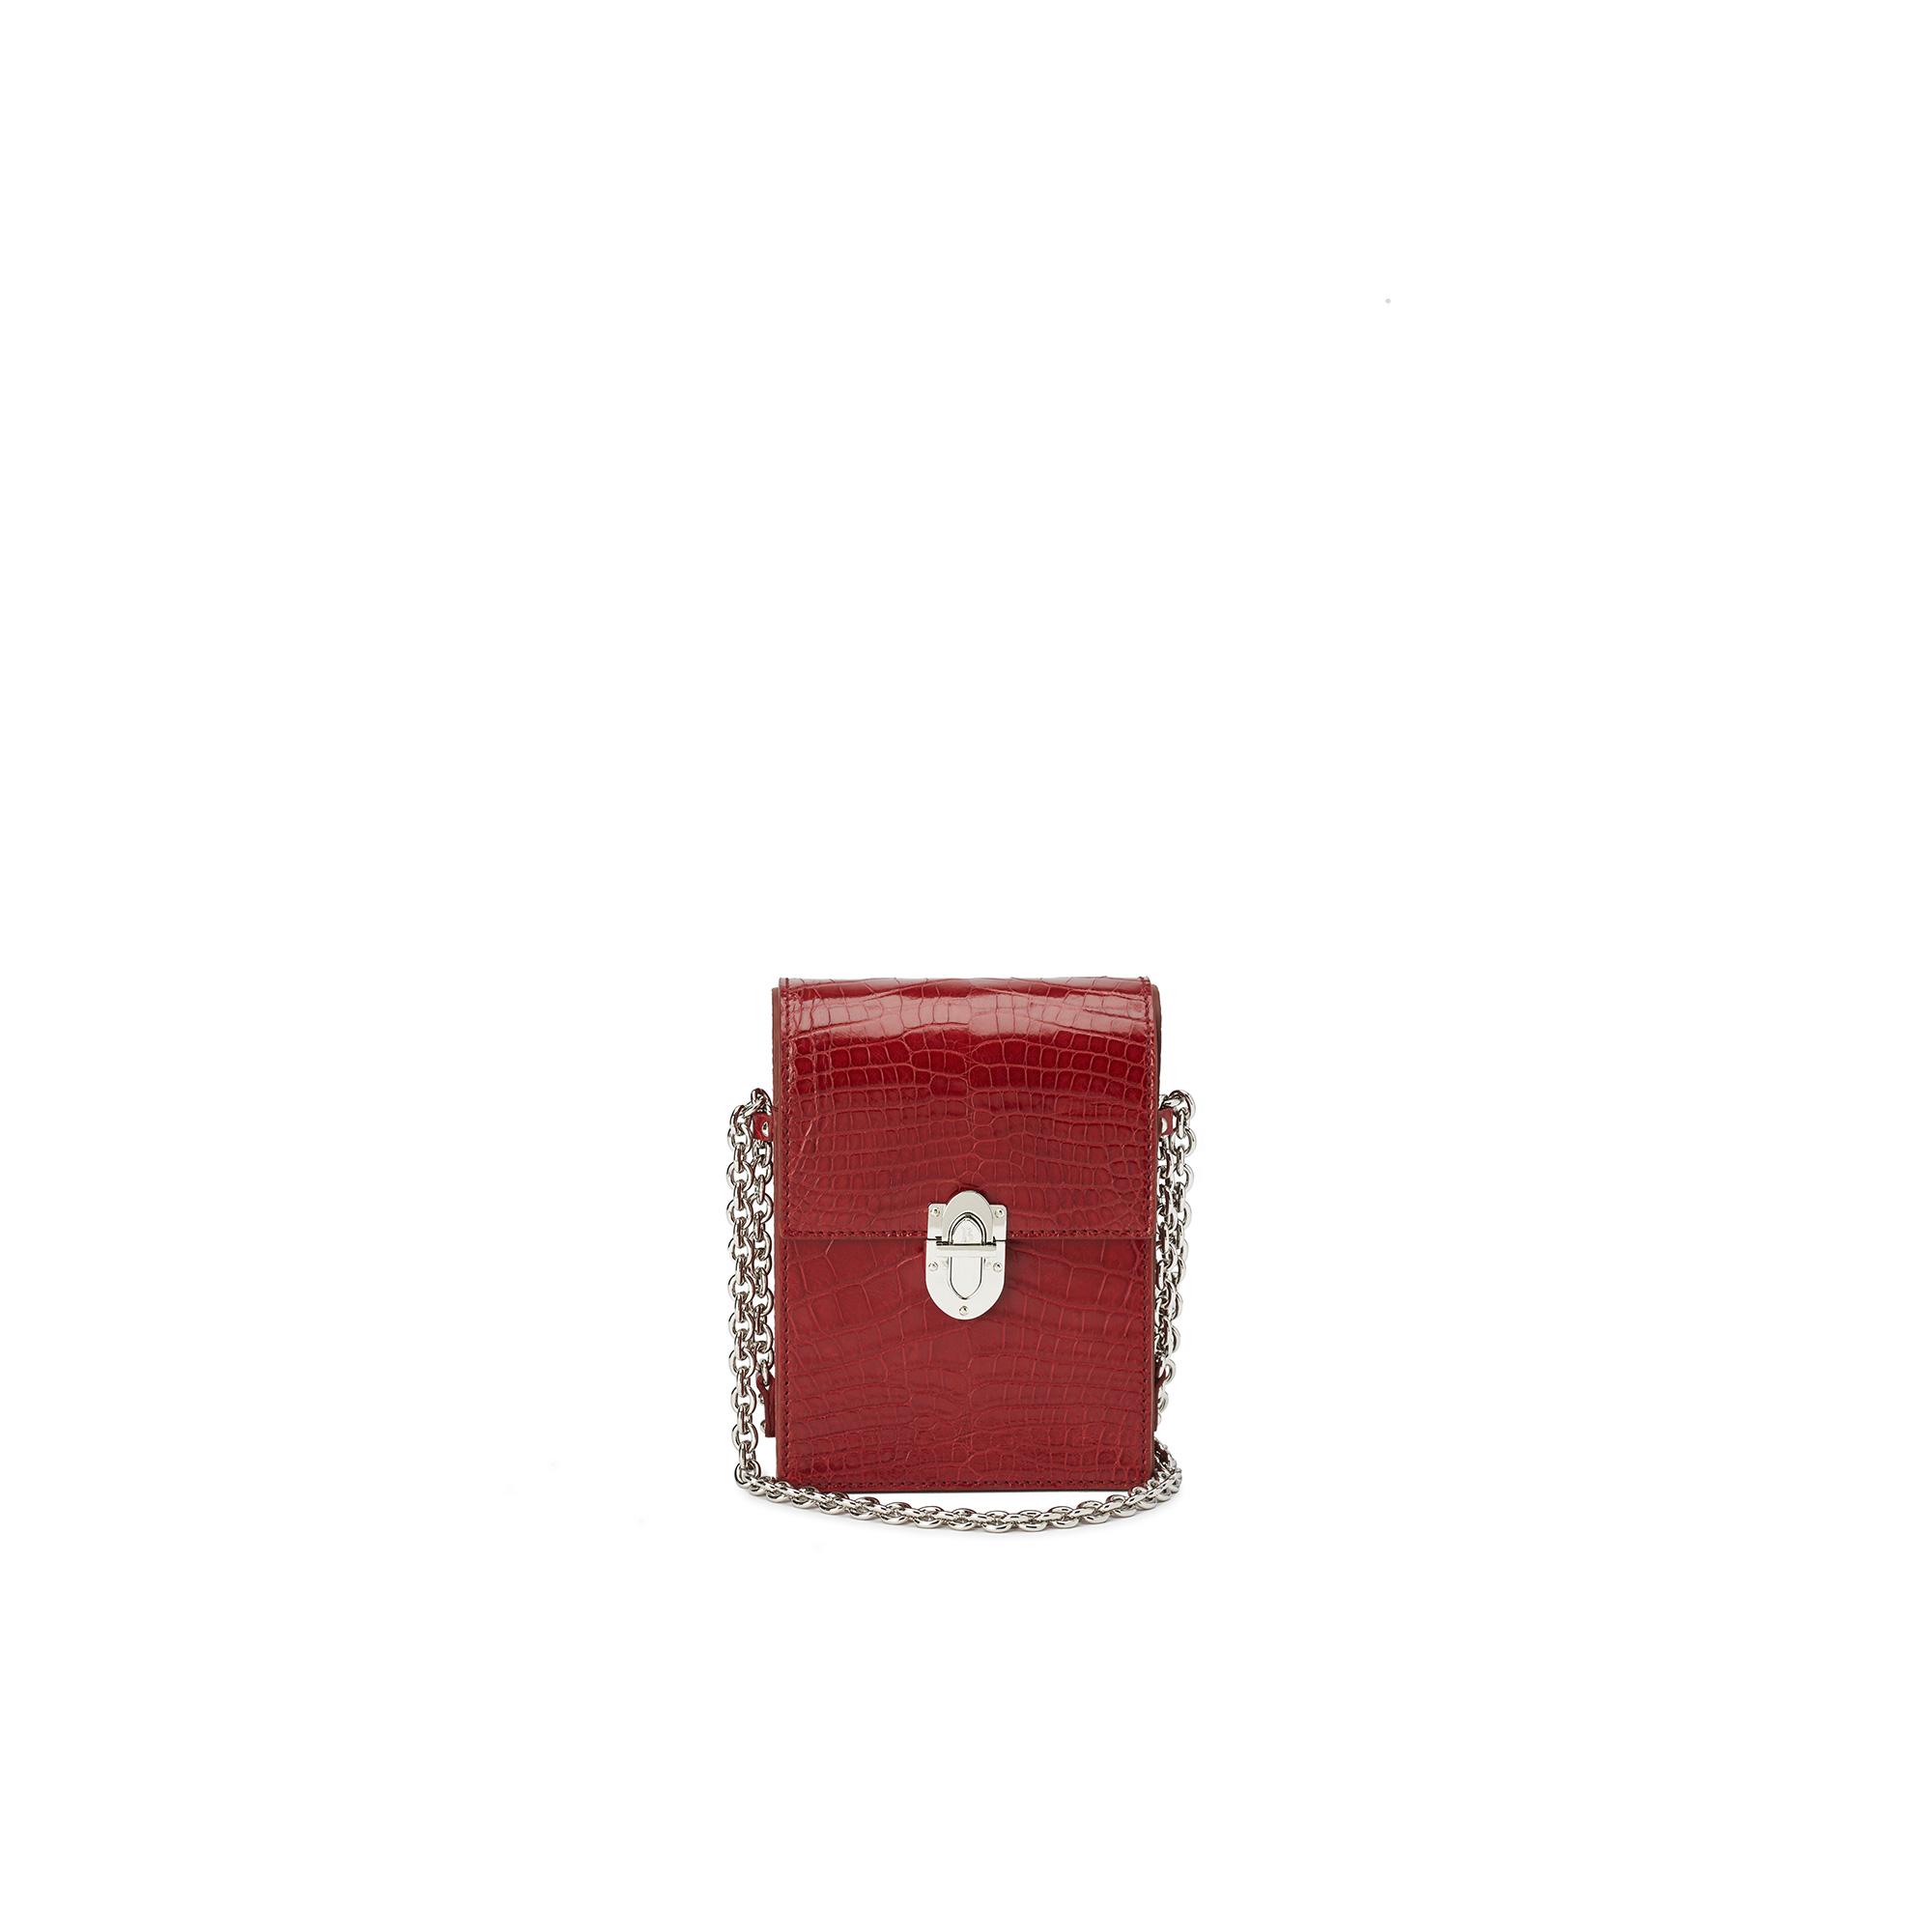 Mini-Gigi-cherry-red-alligator-bag-Bertoni-1949